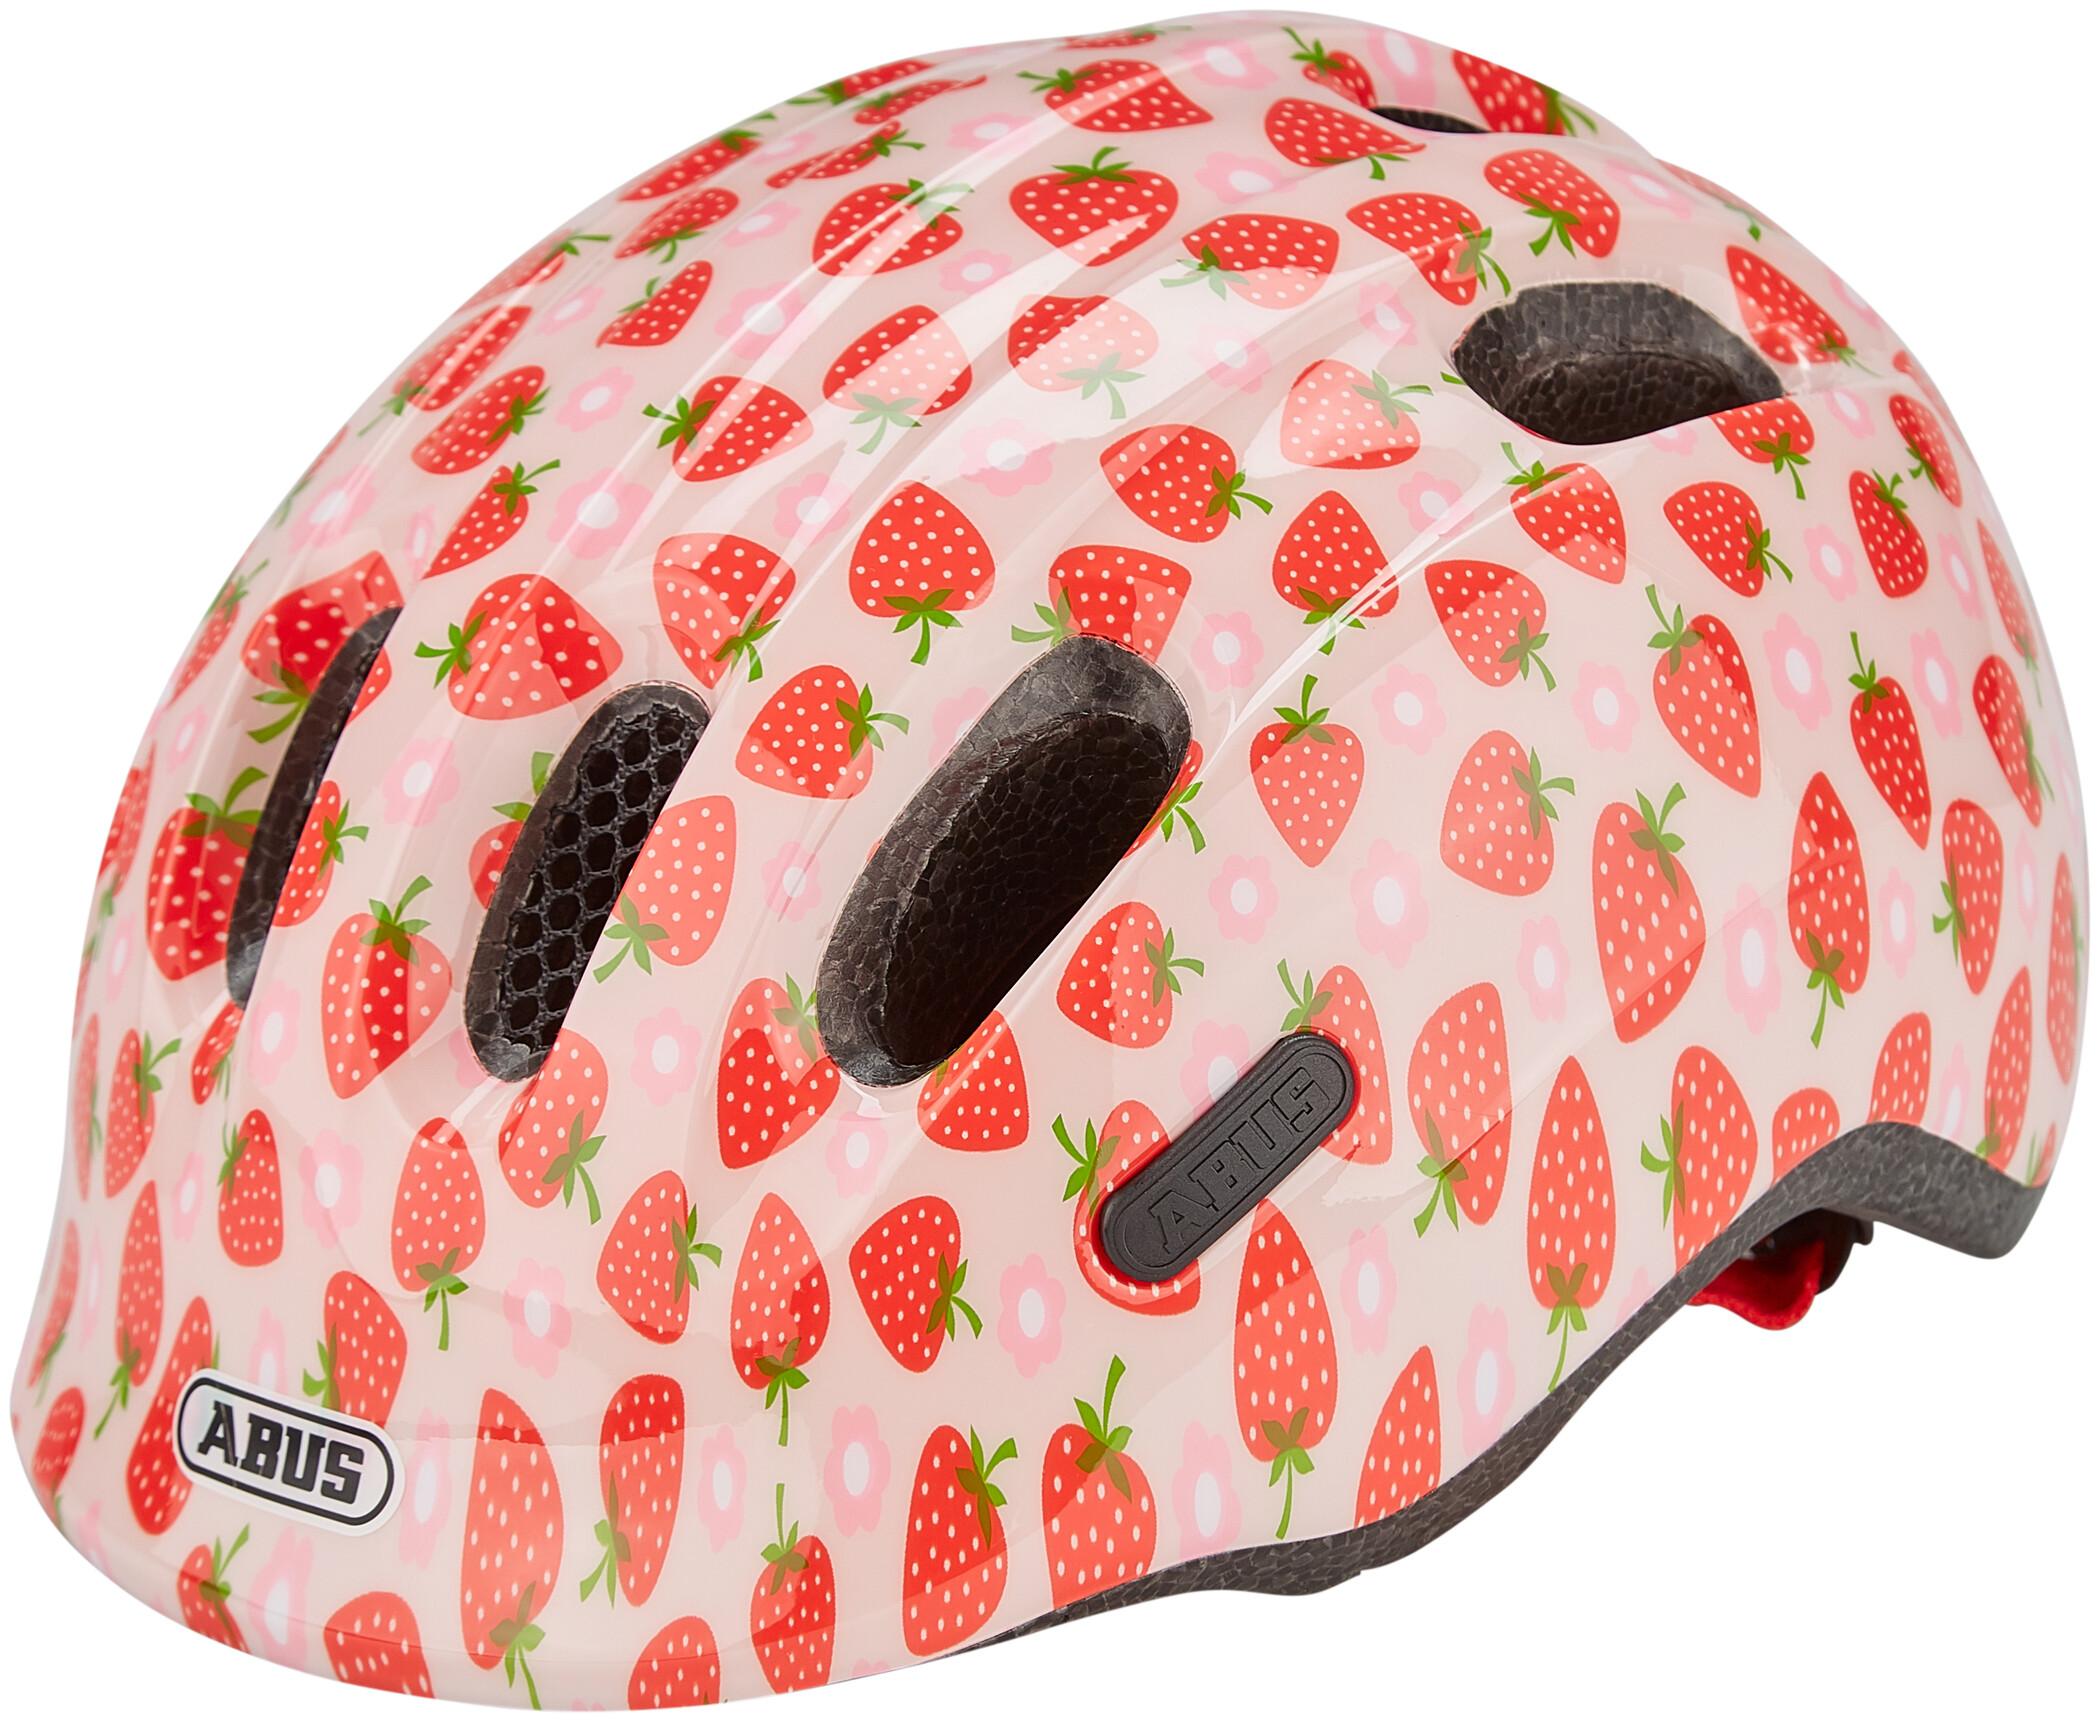 Abus Smiley 2.1 cykelhjelm - Rose Strawberry 50-55 cm. | Helmets